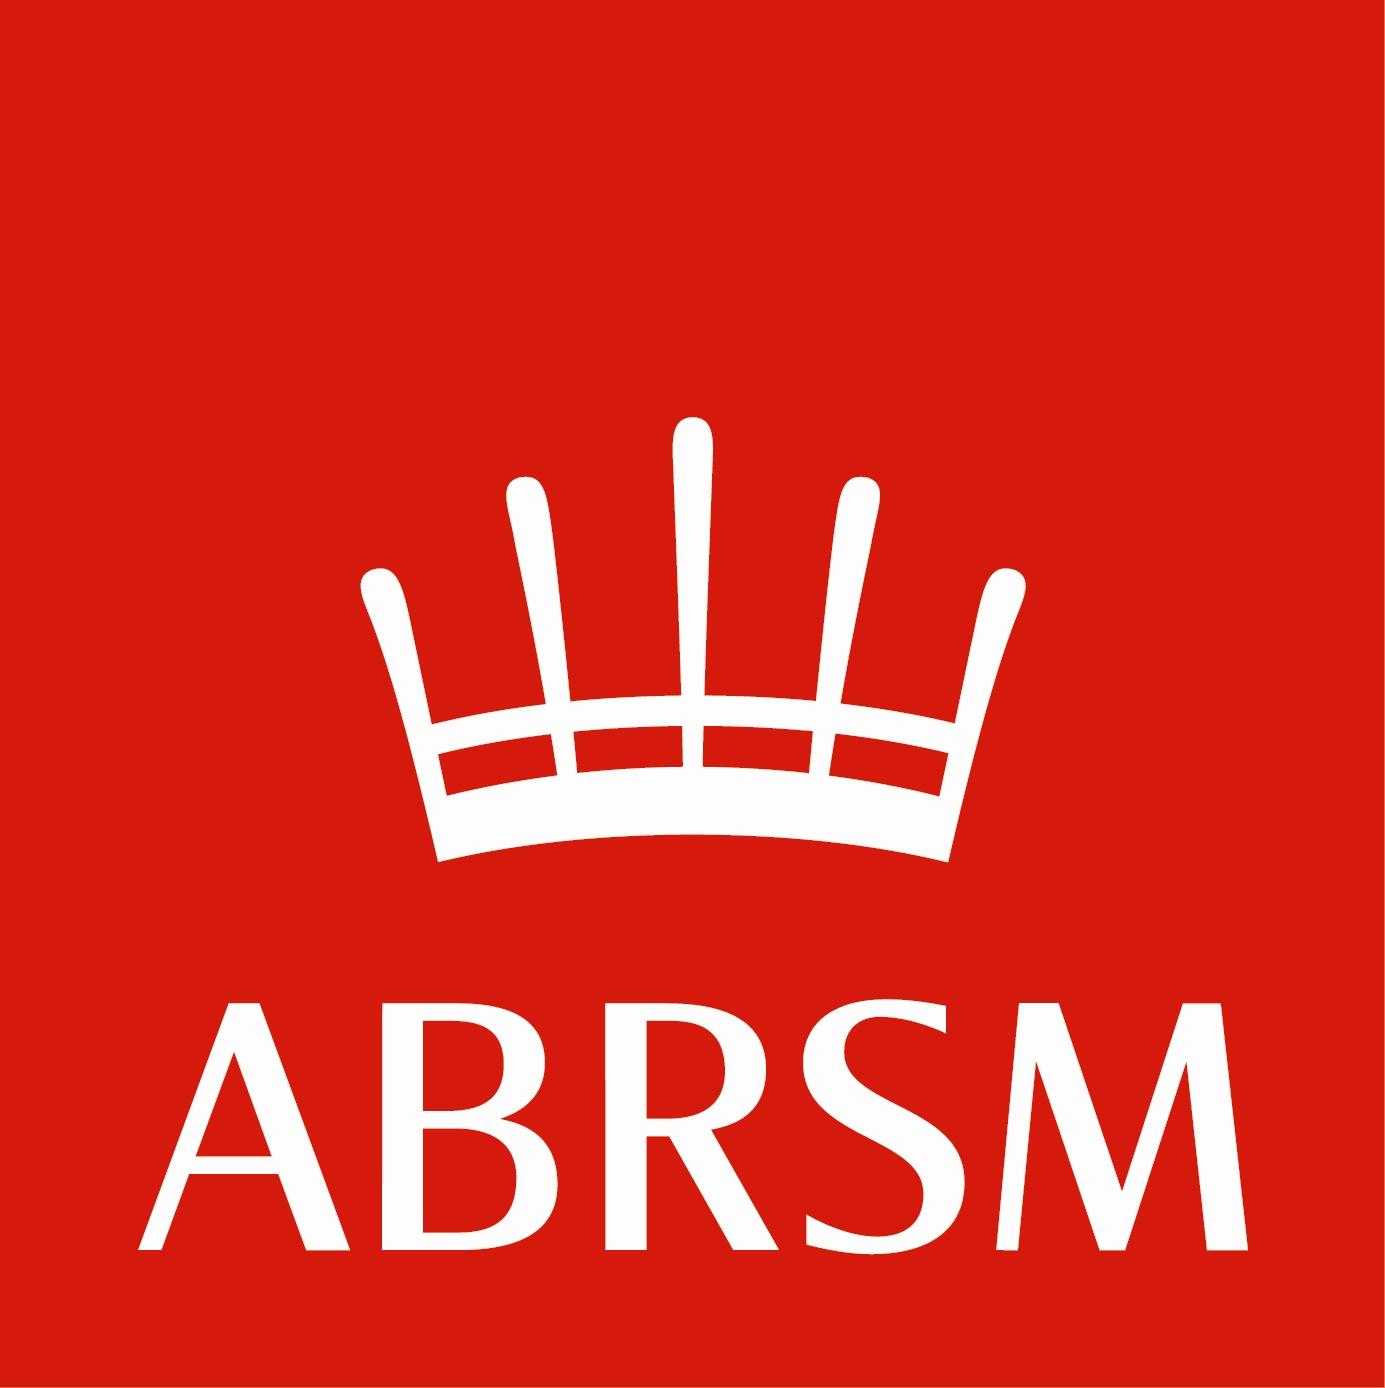 ABSRM - Amadeus